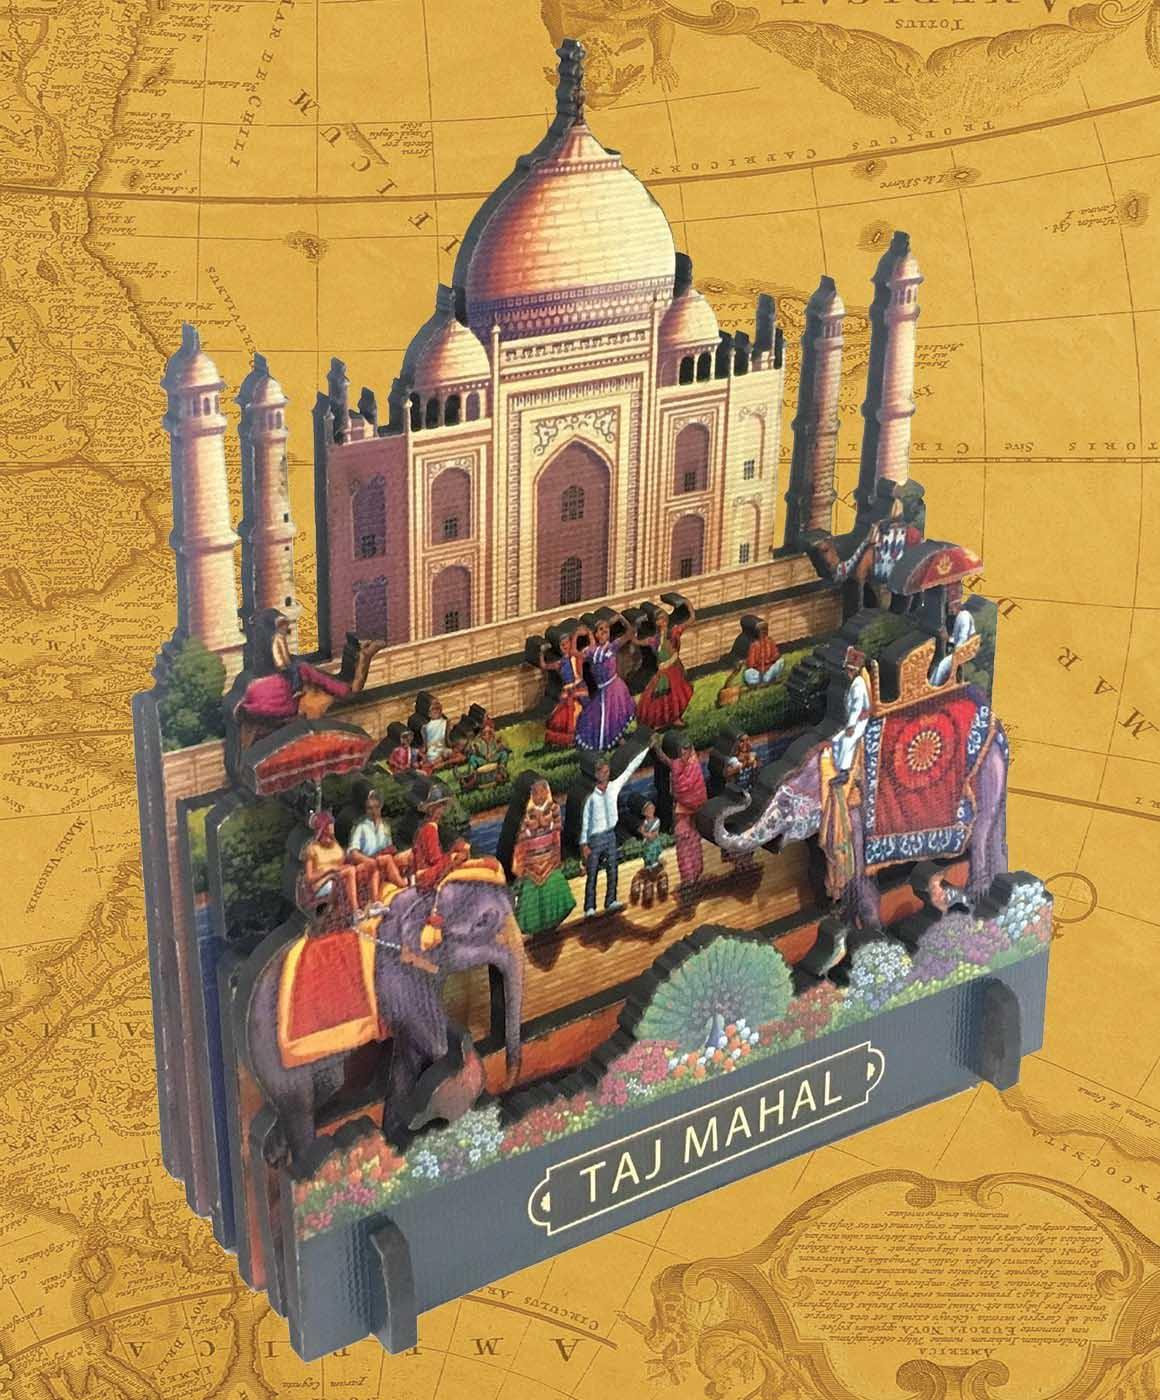 Taj Mahal Taj Mahal 3D Puzzle